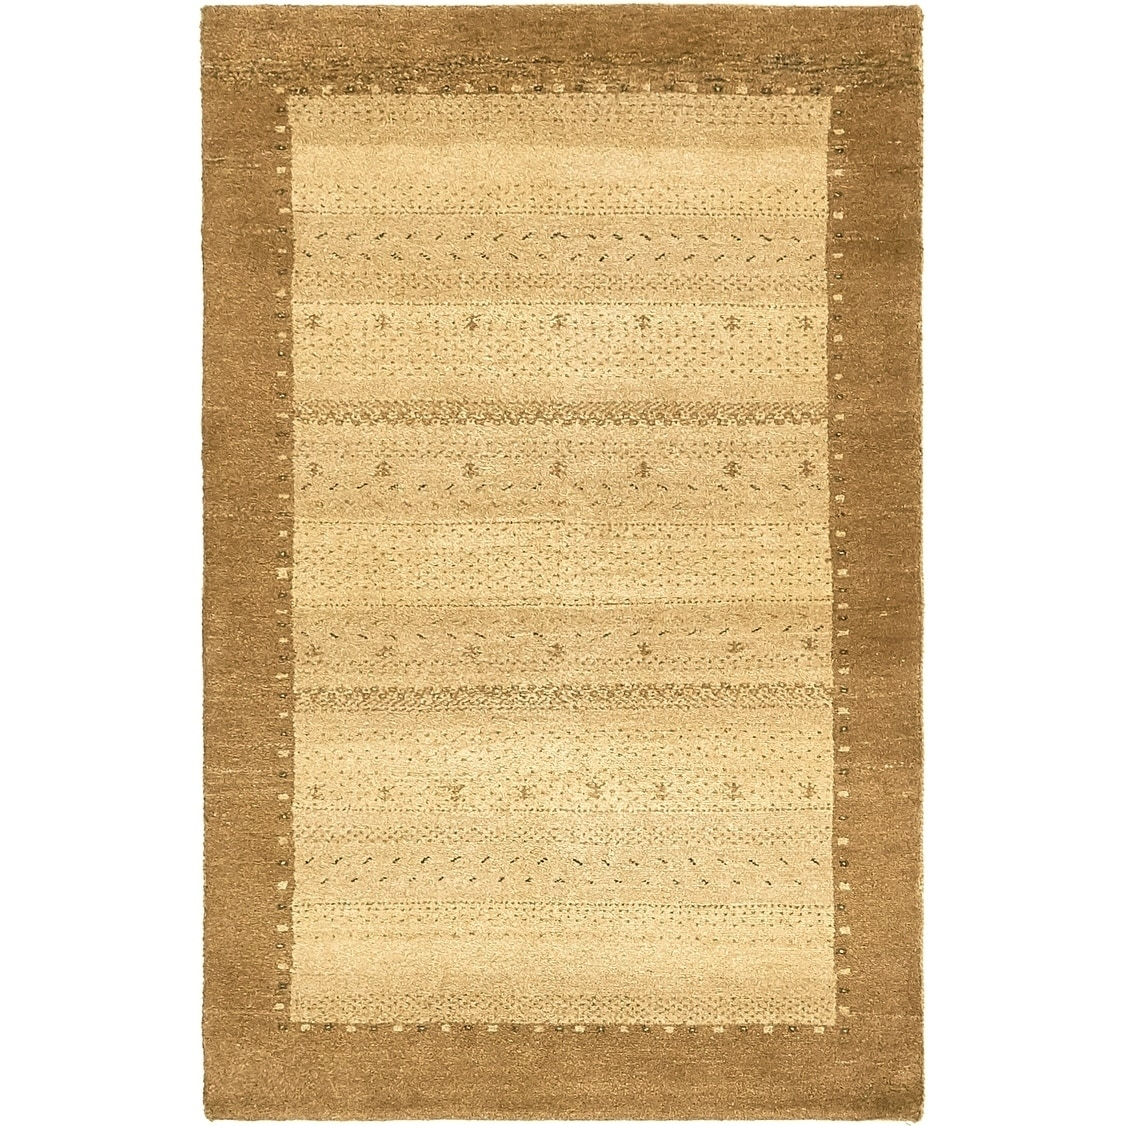 Hand Knotted Kashkuli Gabbeh Wool Area Rug - 3 x 4 10 (Beige - 3 x 4 10)